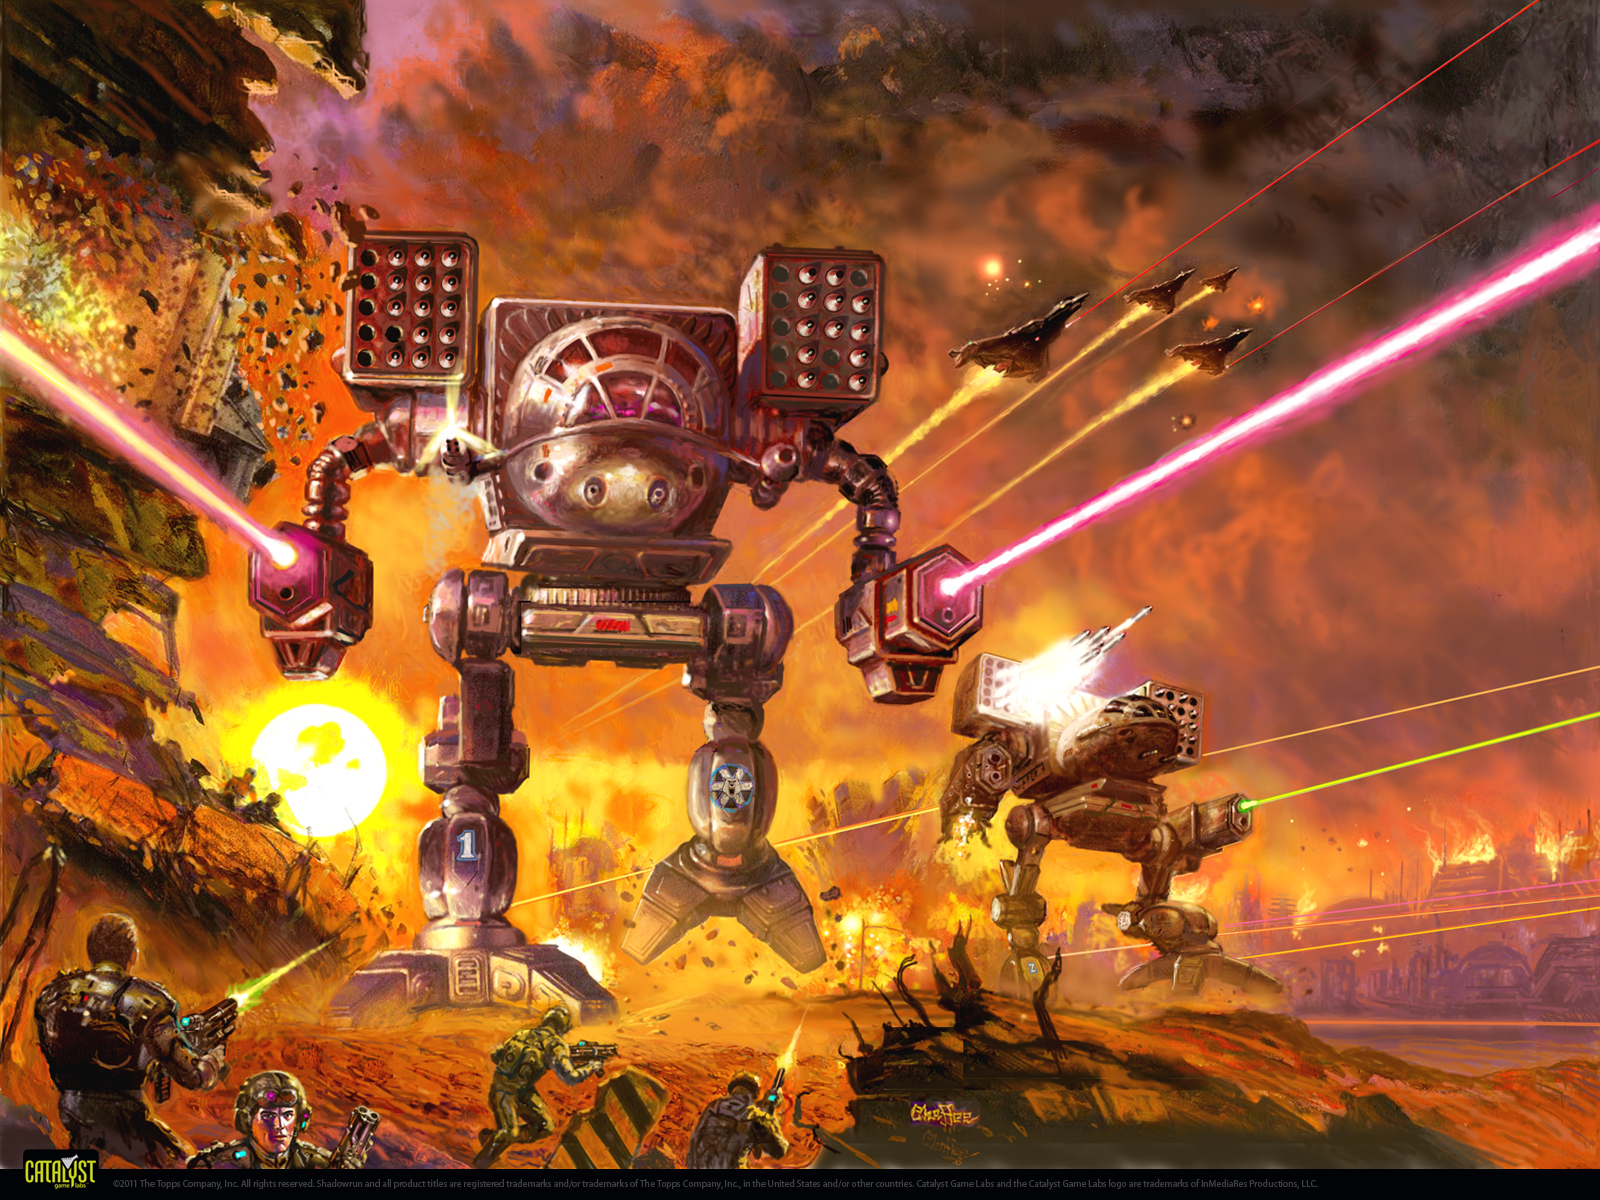 The Universe of Battletech The Written Tale 1600x1200